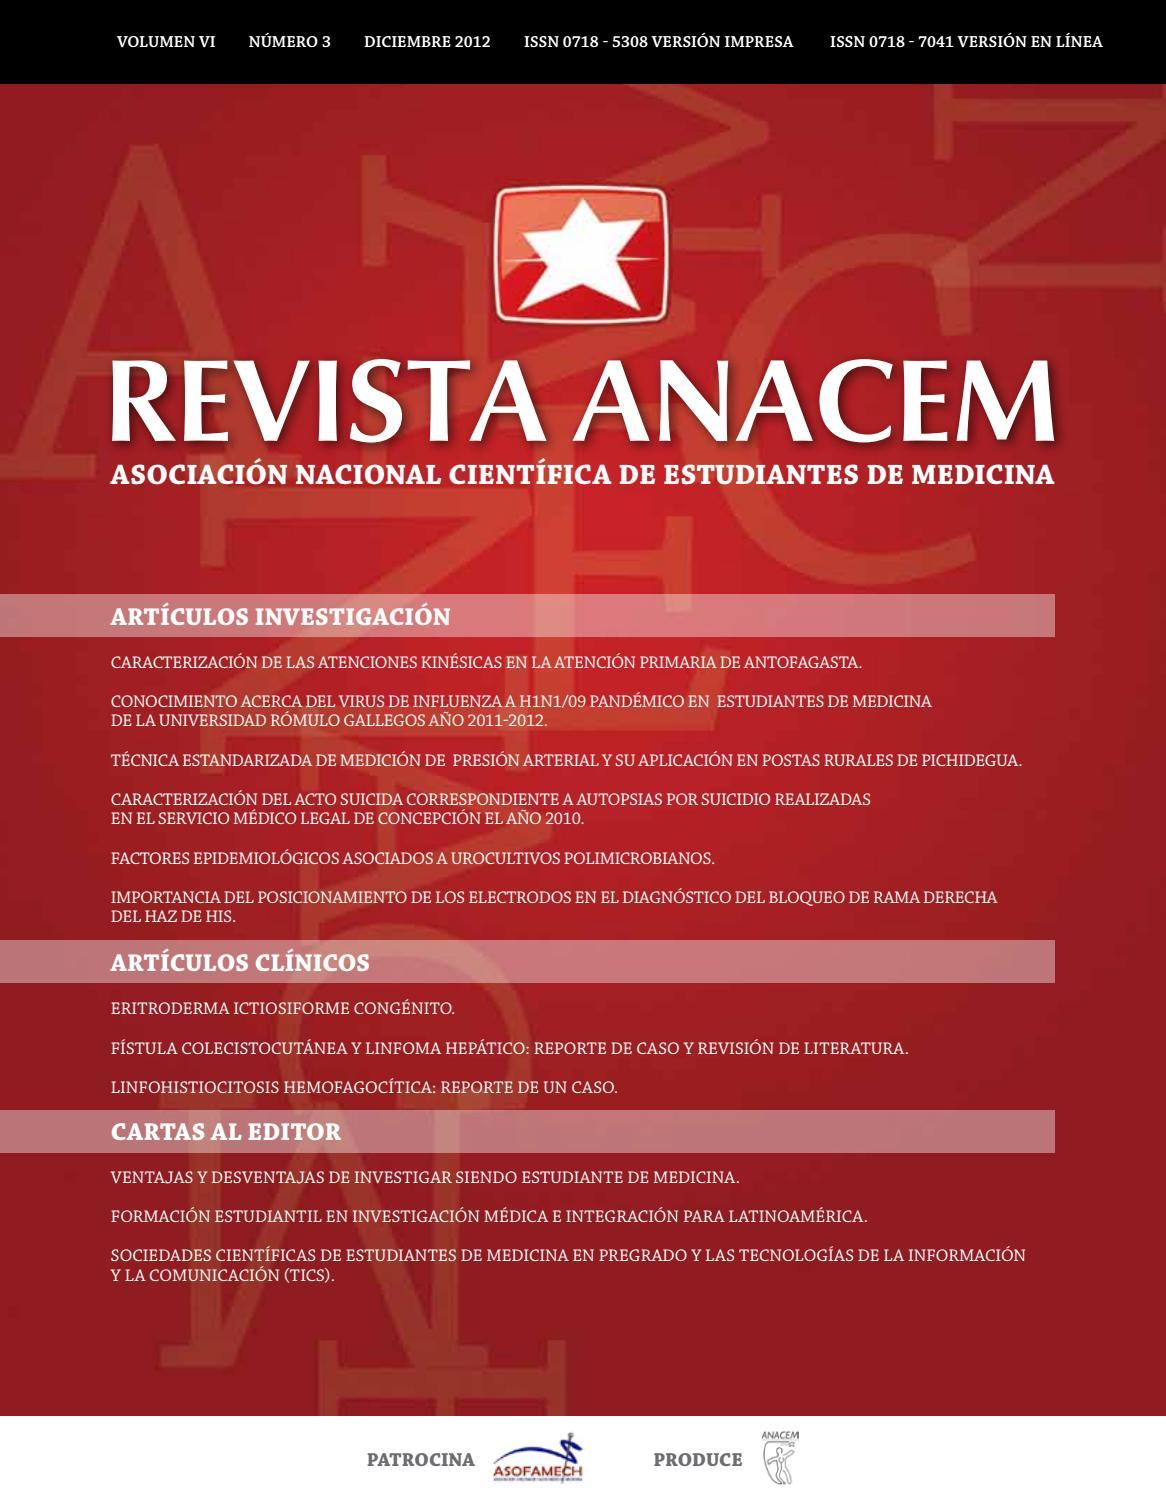 Revista ANACEM 2012;6(3) by REVISTA ANACEM - issuu